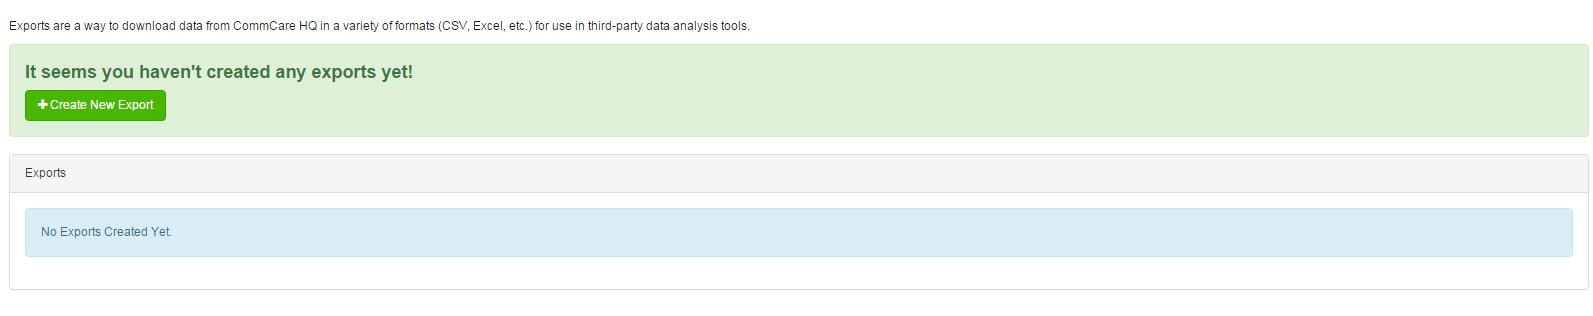 Form Data Export - CommCare Public - Dimagi Confluence